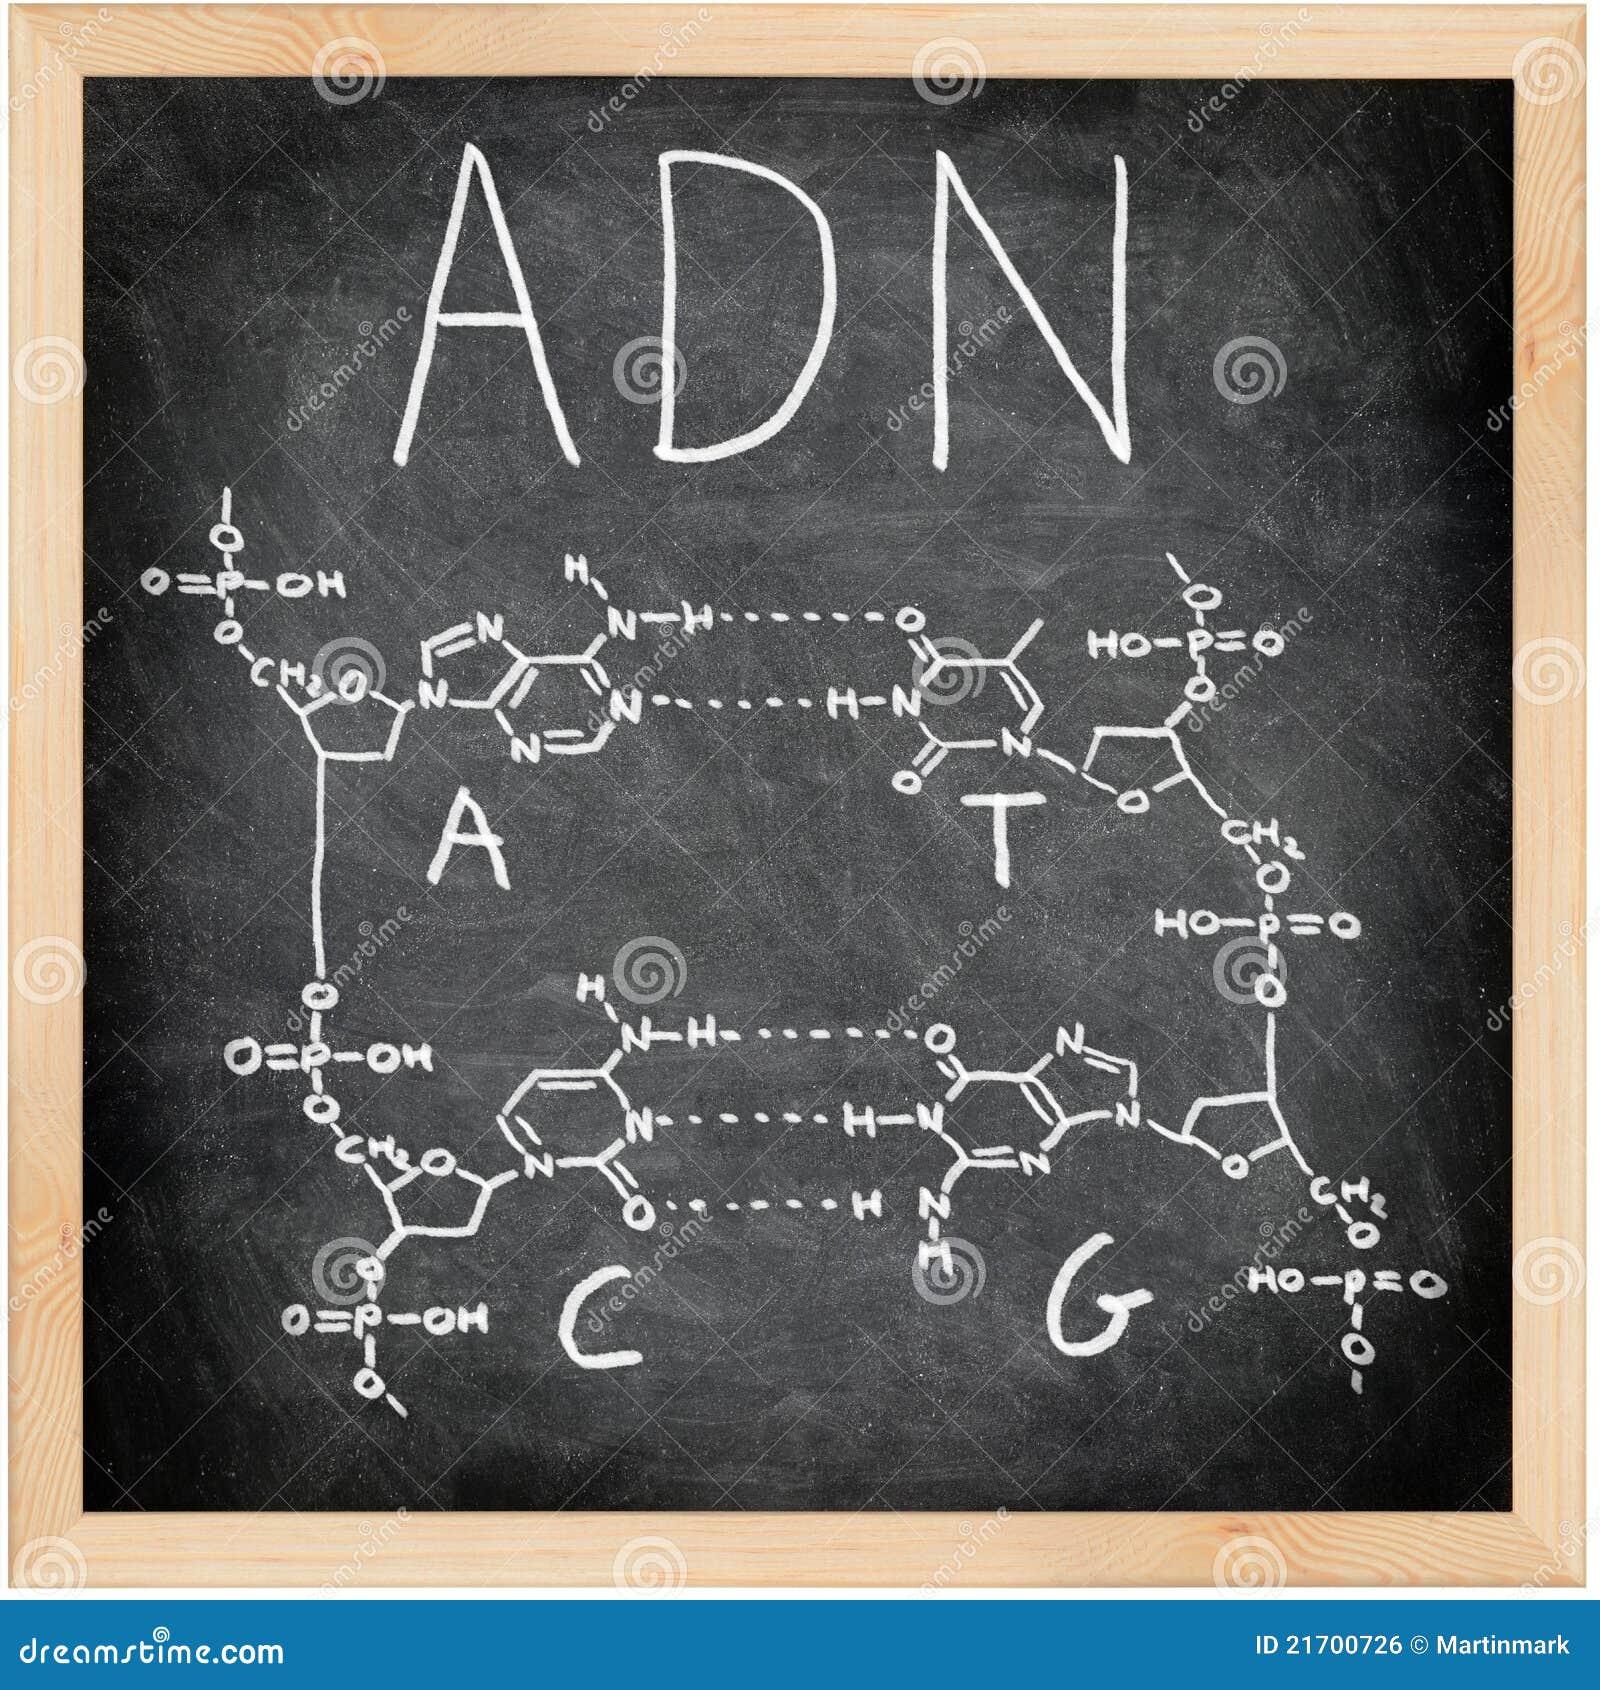 ADN - DNA en español, francés y portugués.